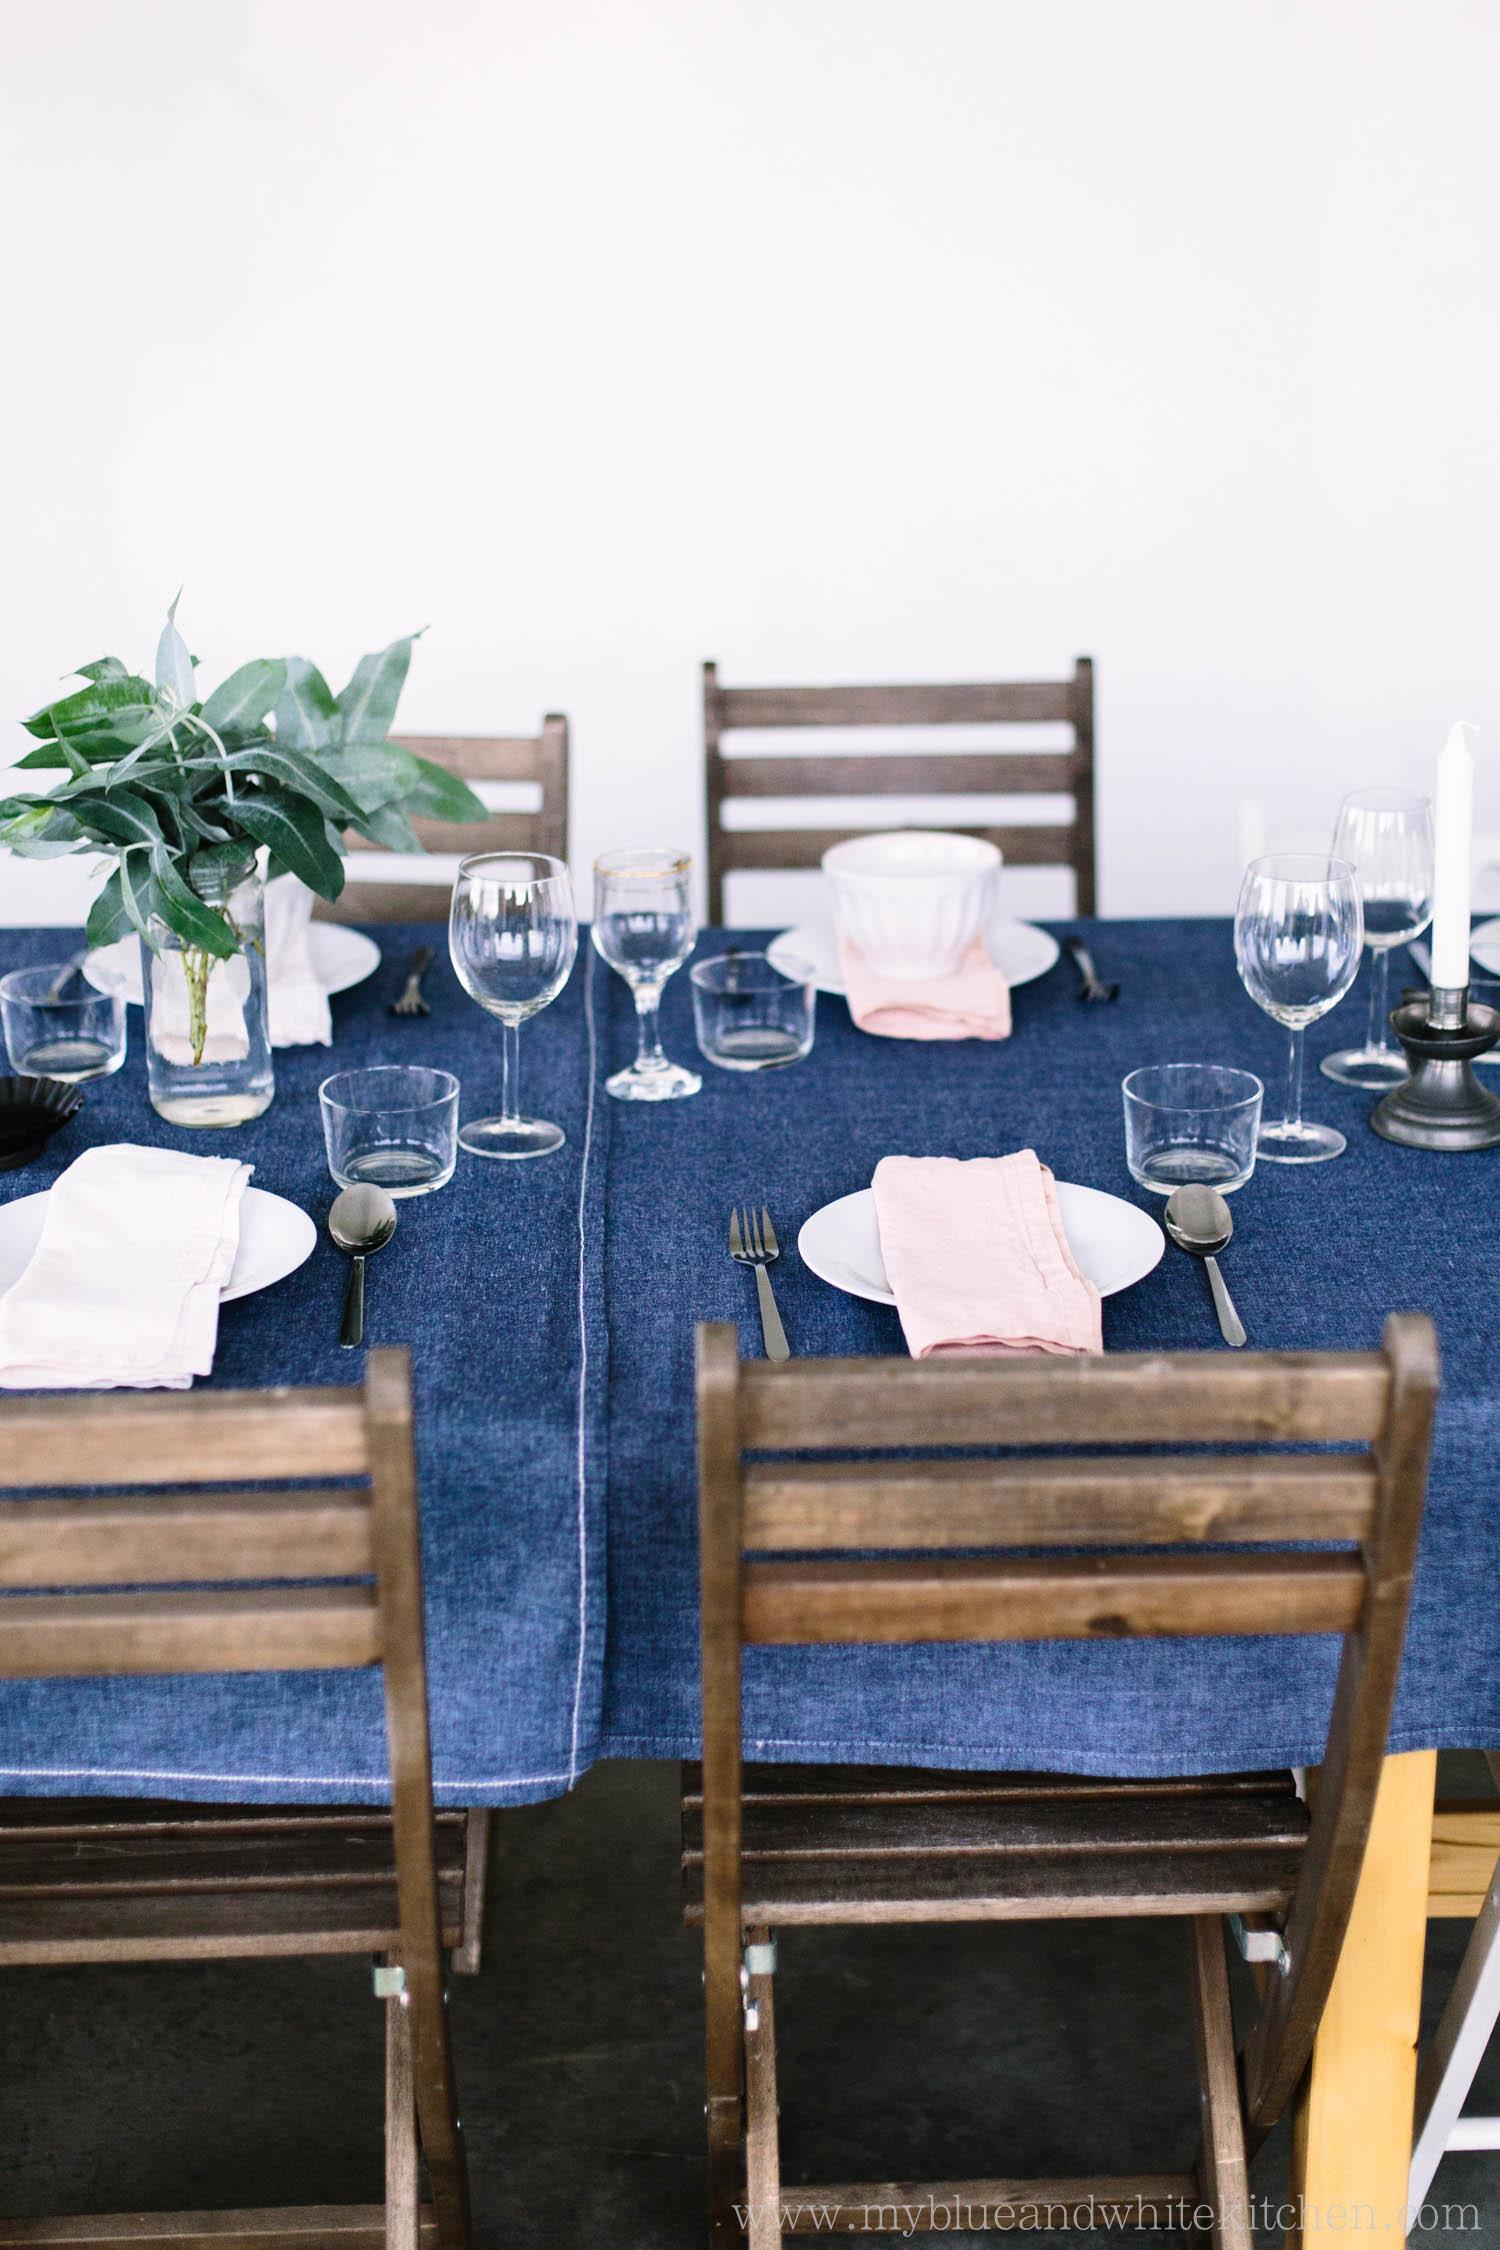 Alentejo Workshop May 2016 | My Blue&White Kitchen